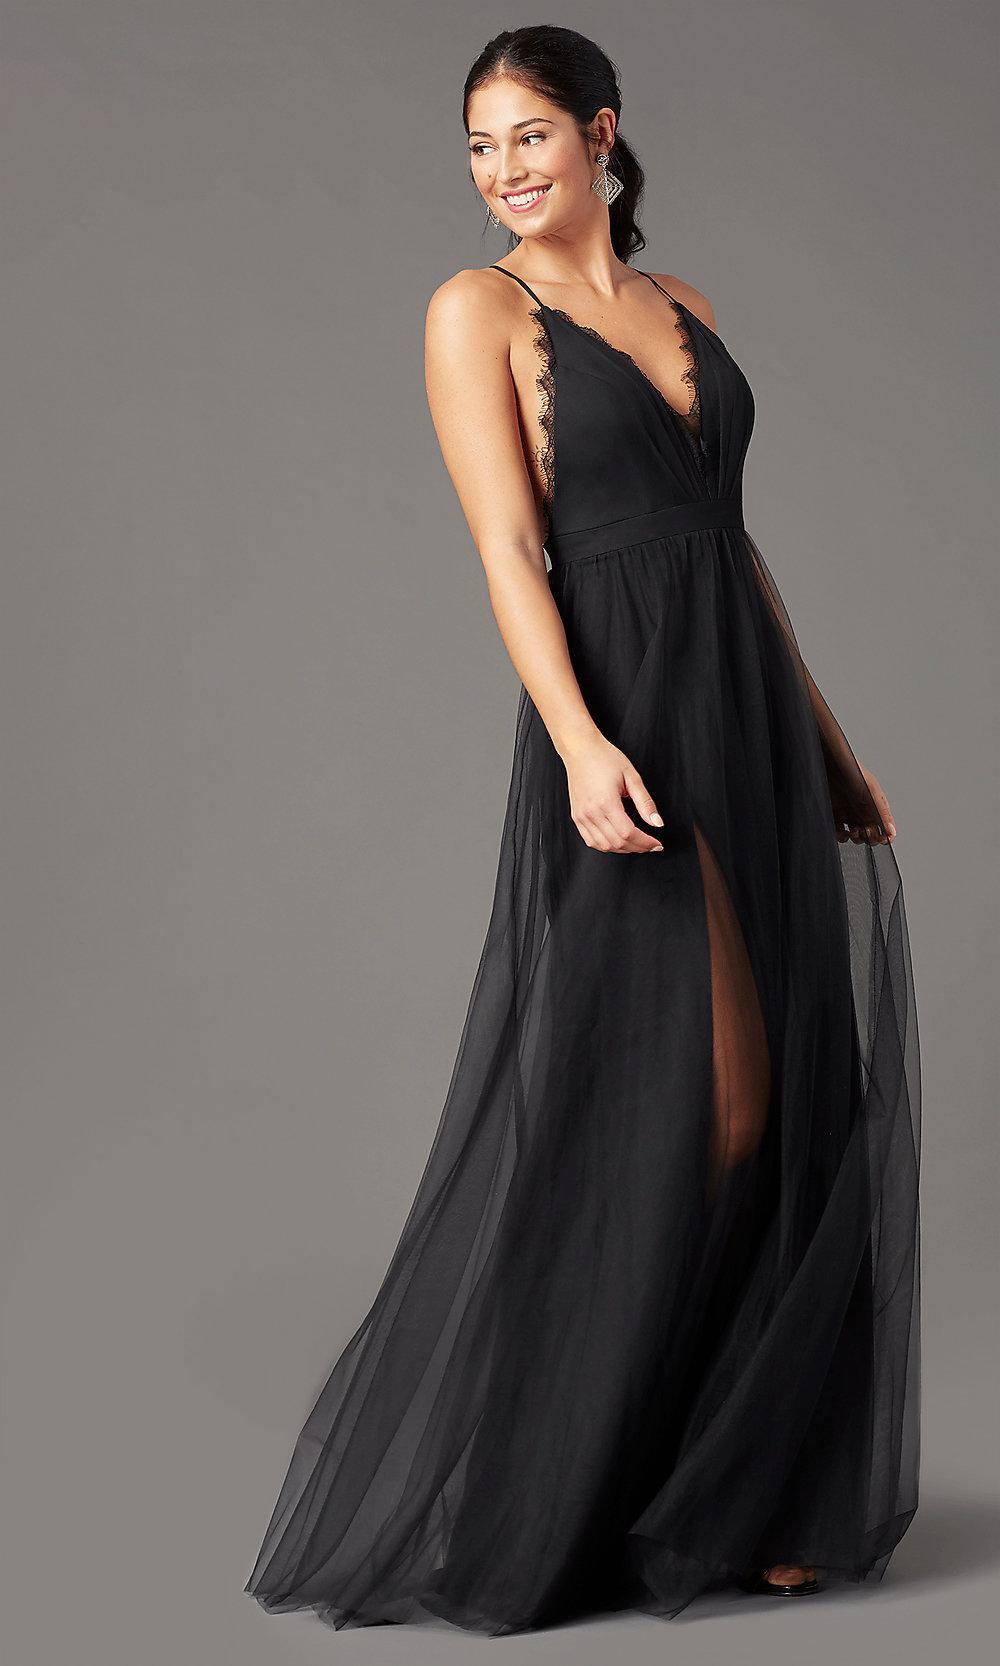 Open back blacked prom dress